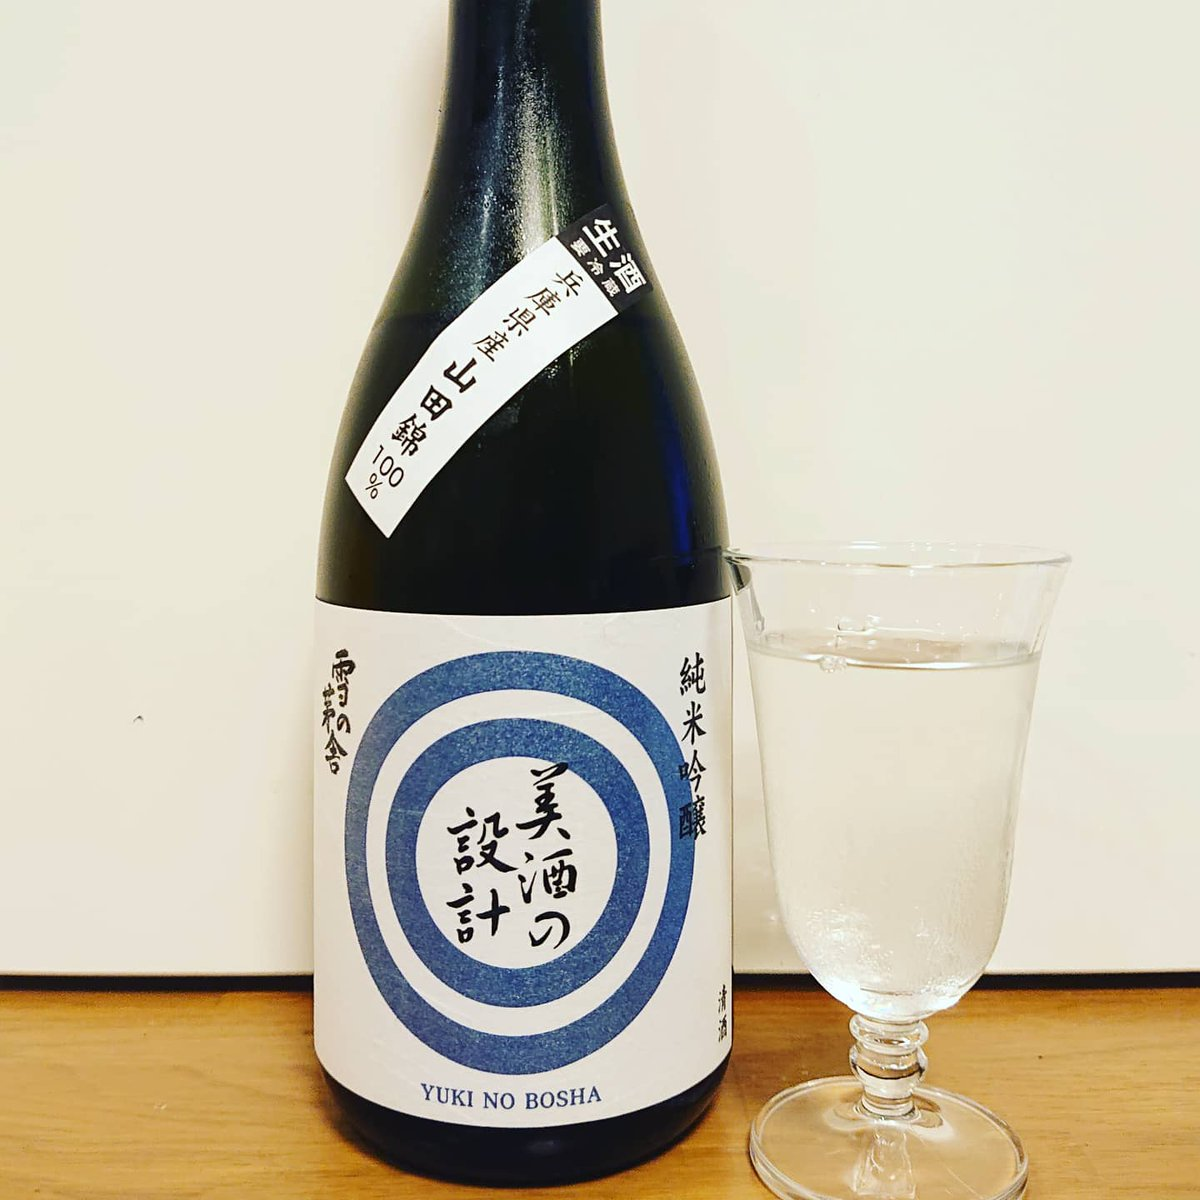 test ツイッターメディア - 今日の秋田の日本酒 齋彌酒造店「雪の茅舎 美酒の設計 純米吟醸 生酒」 個人的No.1日本酒 https://t.co/5RyU0PL2YQ https://t.co/GZYO7cyja5